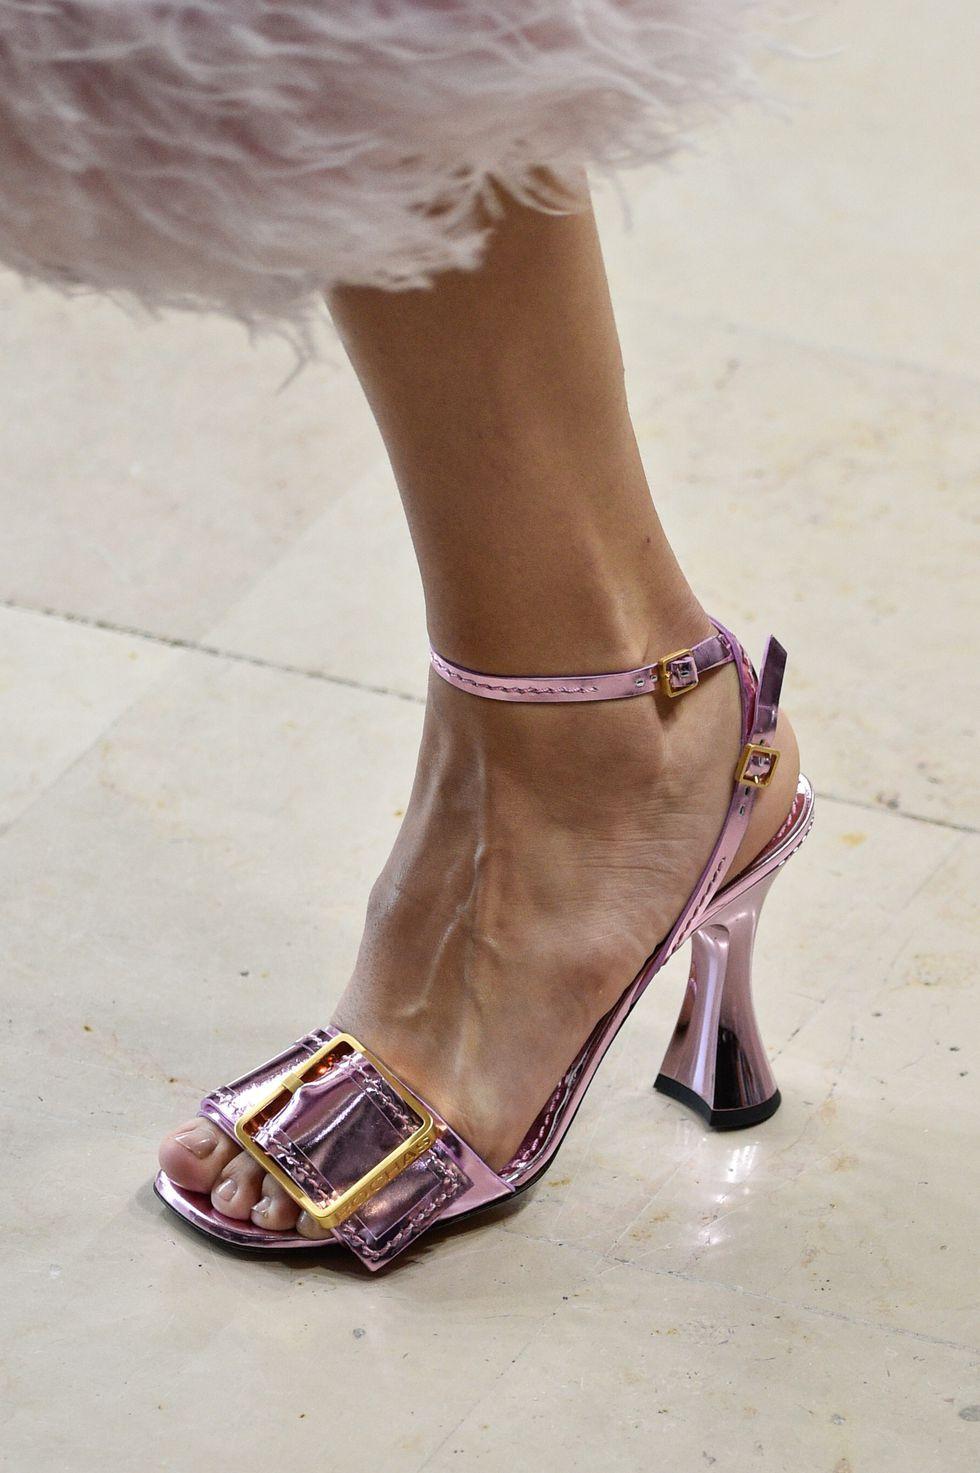 Pin By M On Fash Shine Trending Shoes Women Shoes Heels